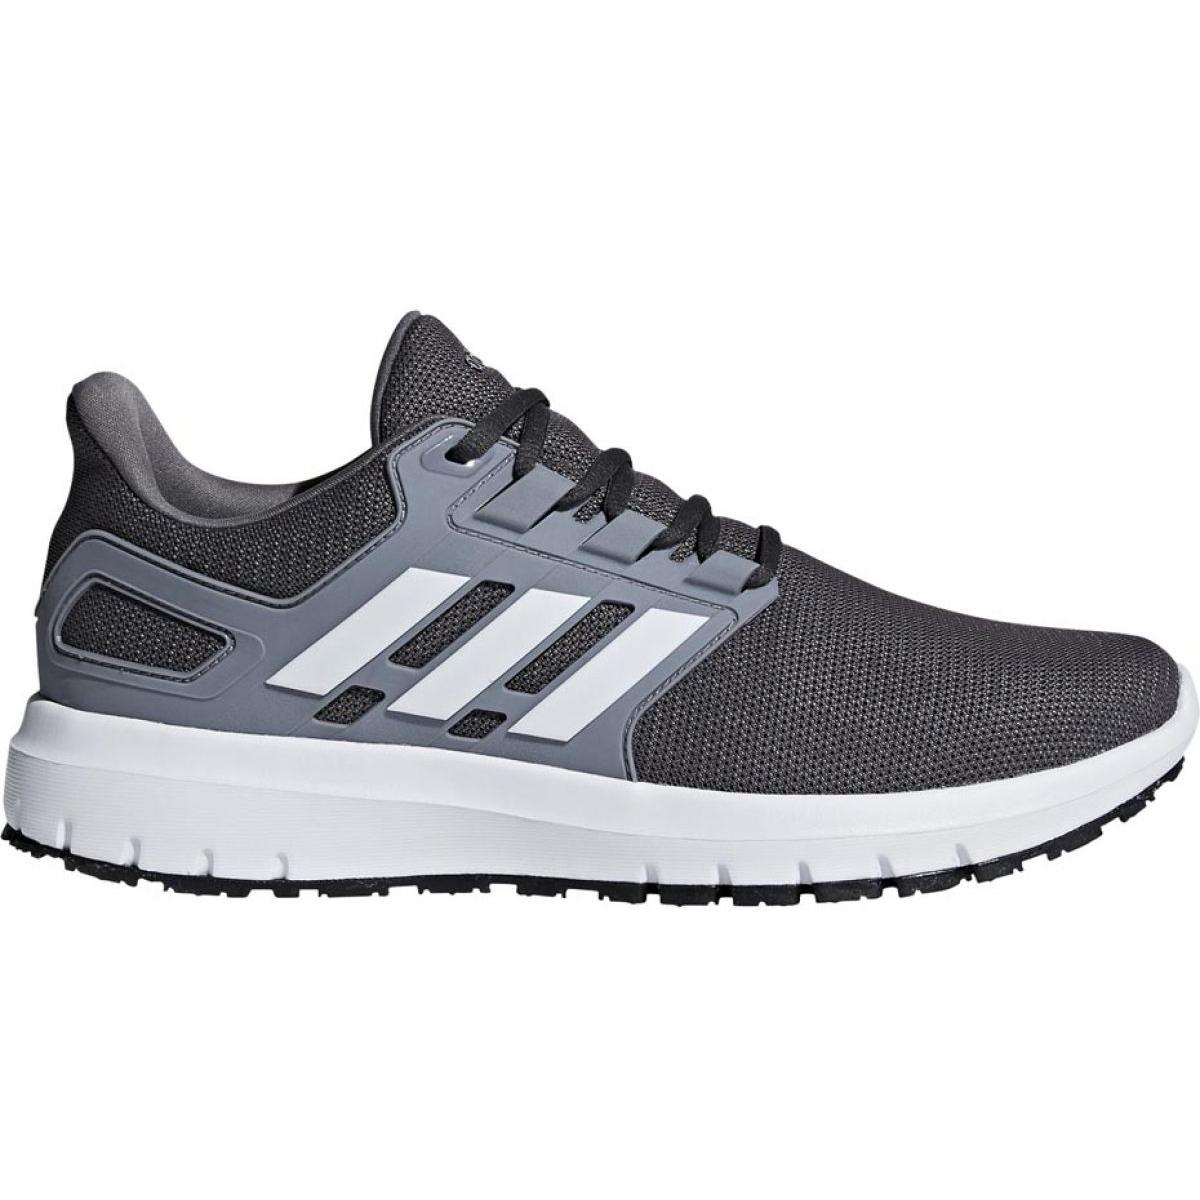 Grau Laufschuhe adidas Energy Cloud 2 M B44751